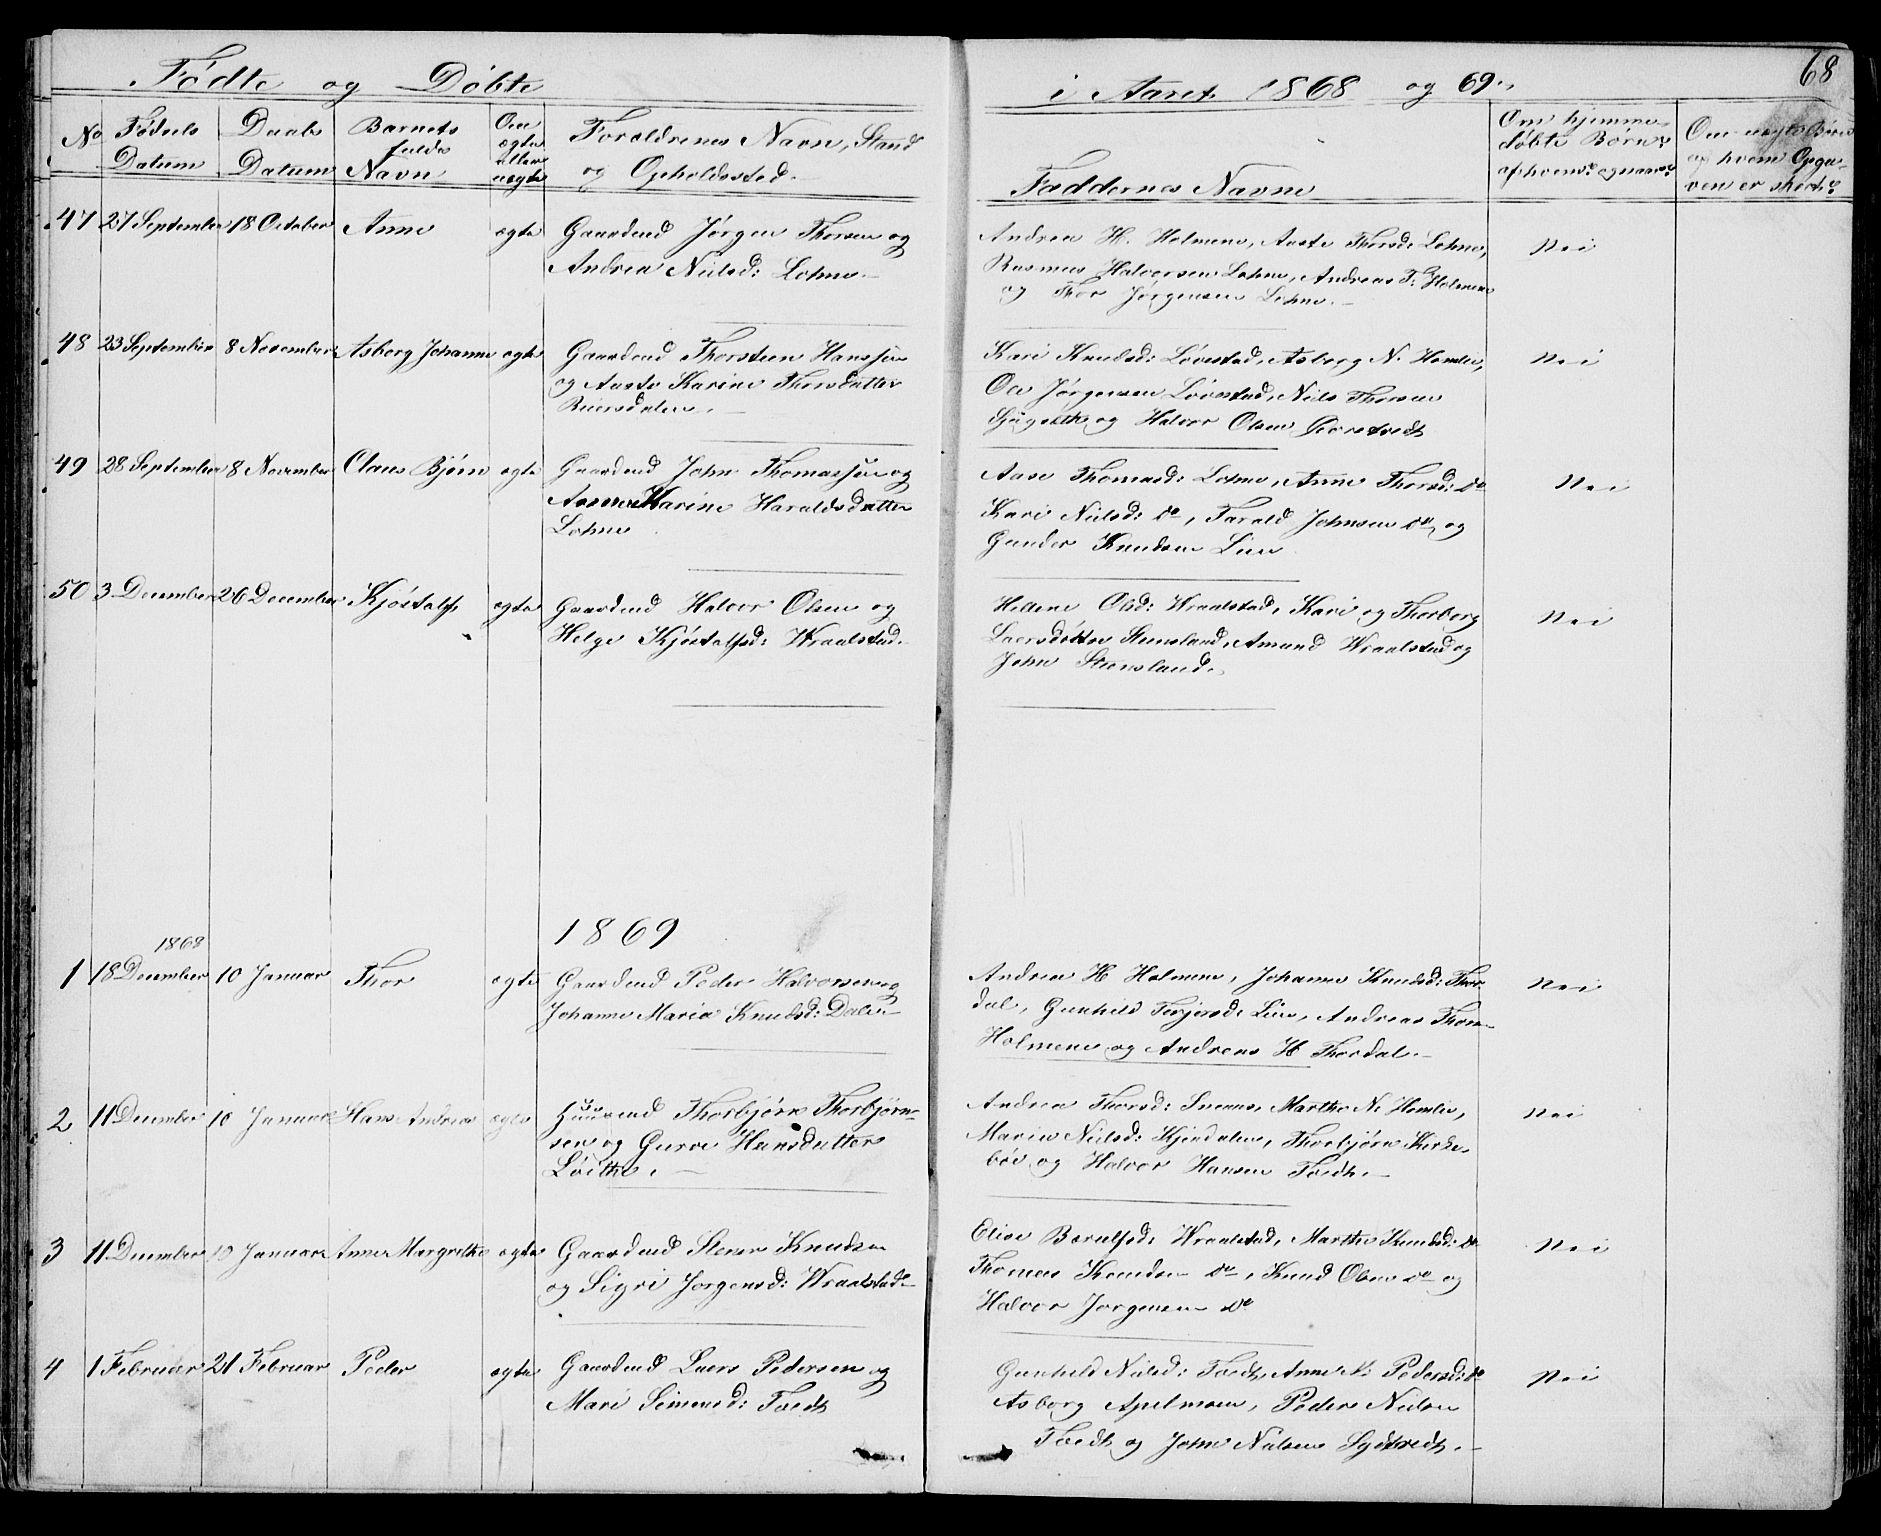 SAKO, Drangedal kirkebøker, G/Gb/L0001: Klokkerbok nr. II 1, 1856-1894, s. 68